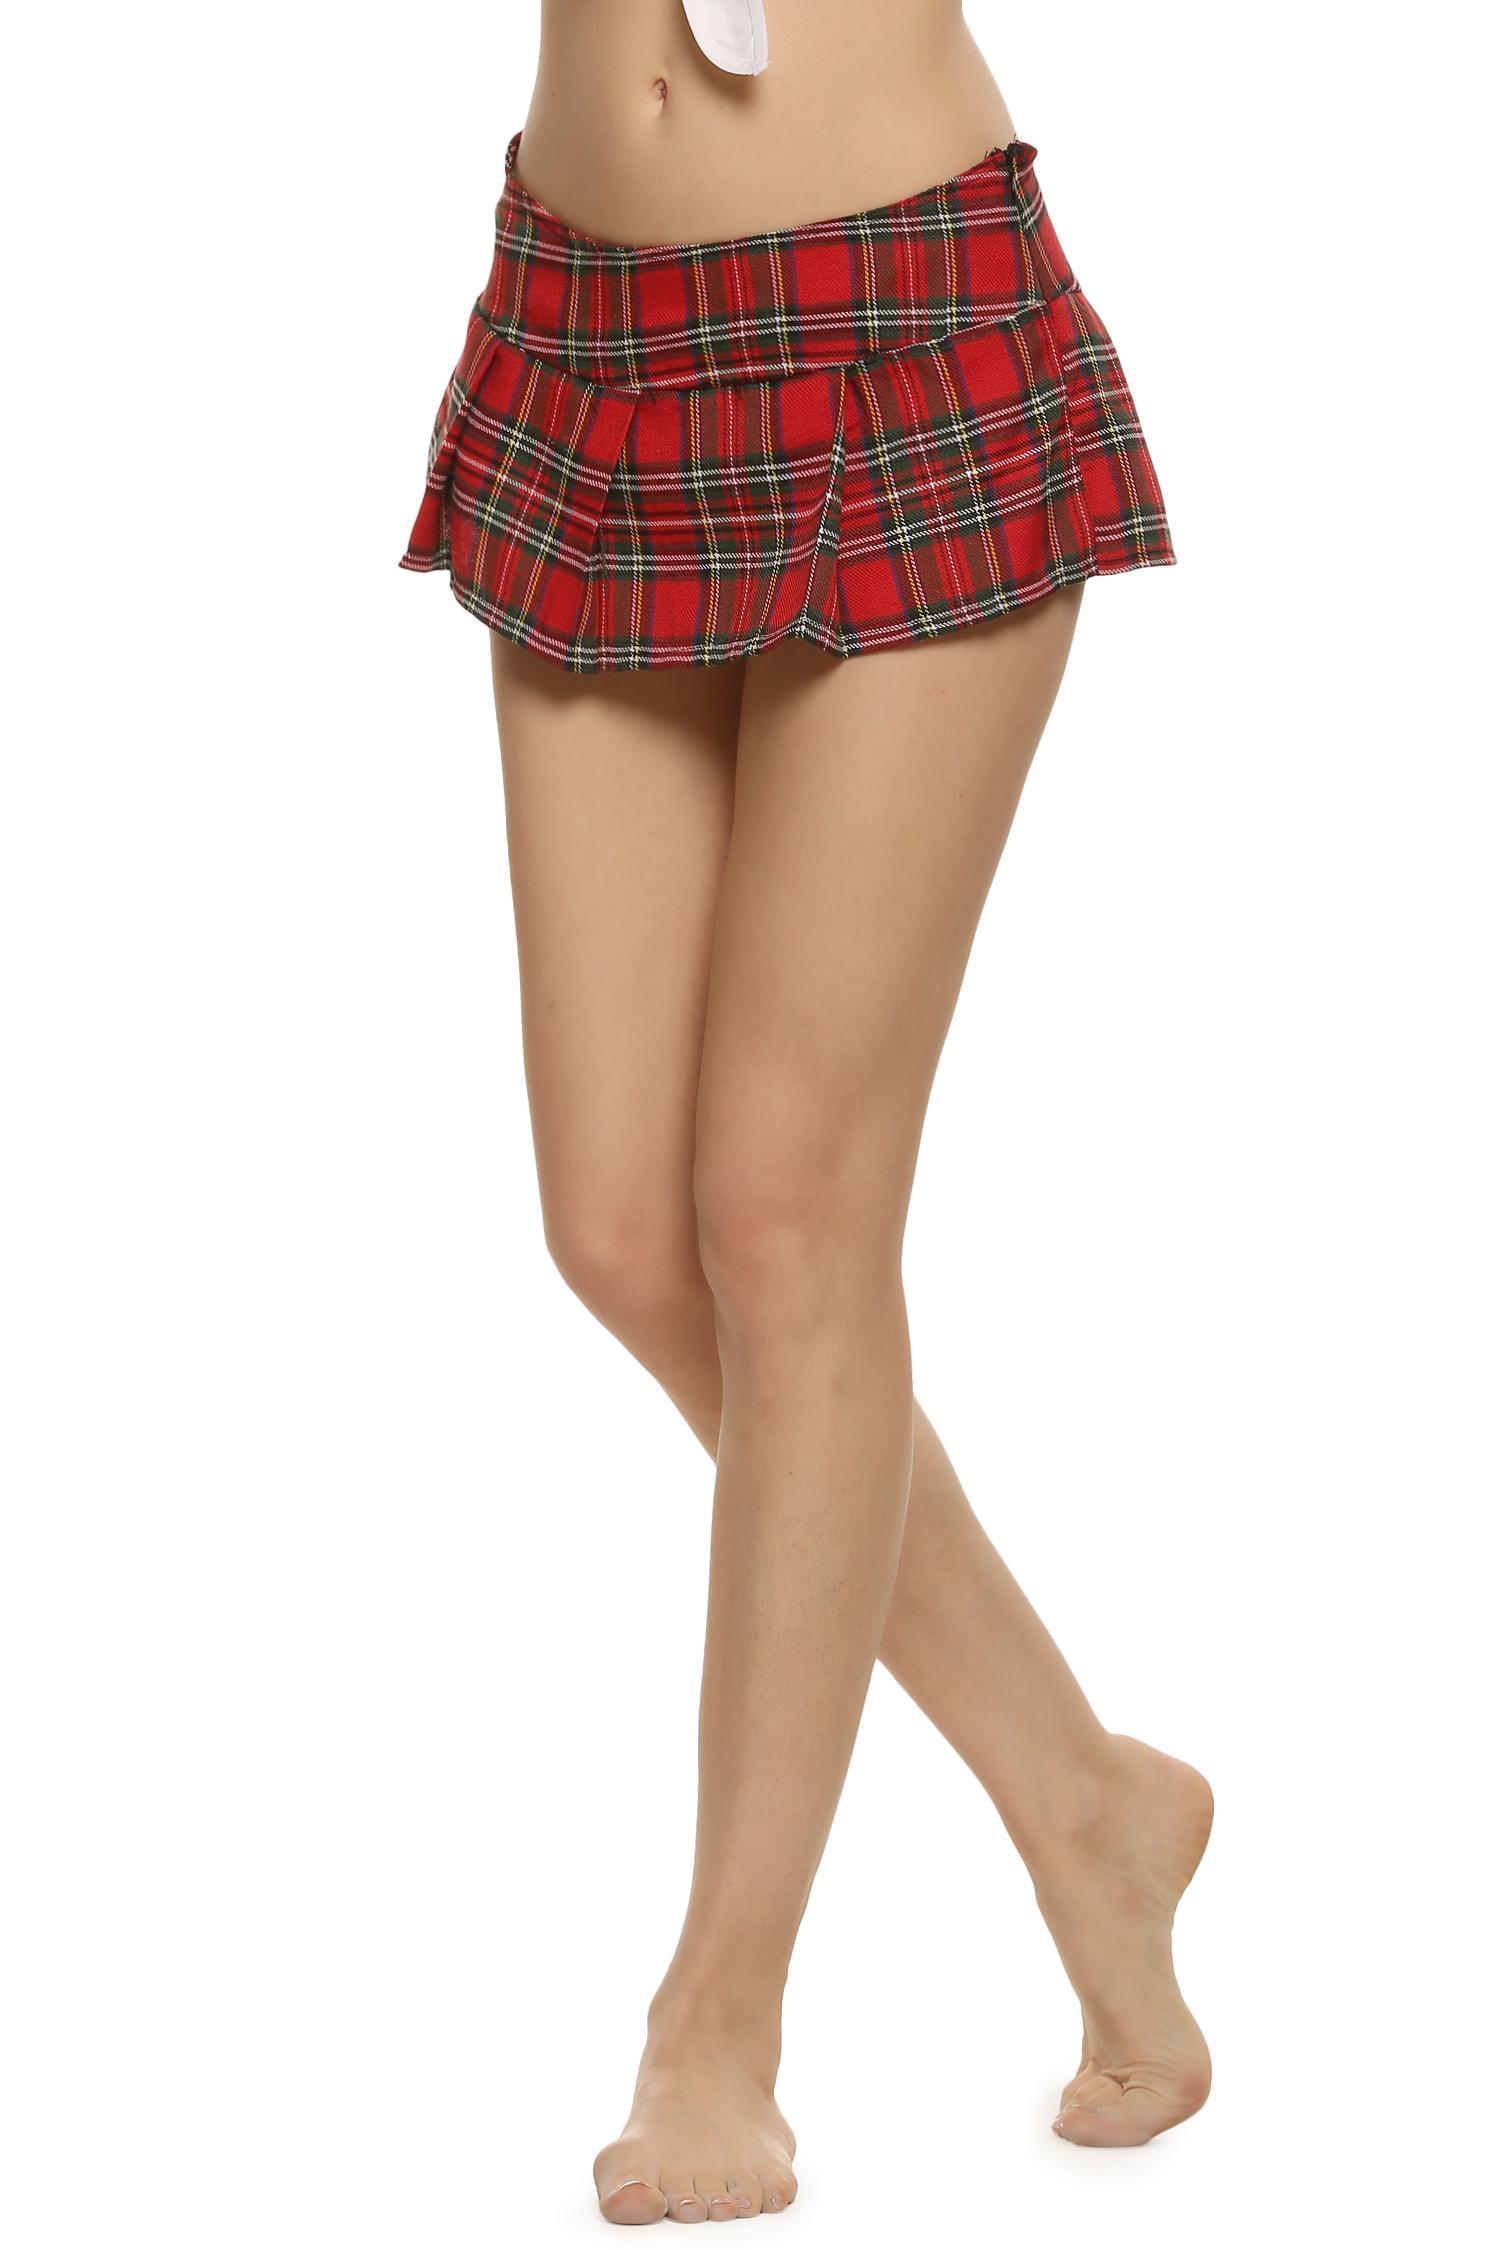 Sexy Lady Schoolgirl Cosplay Sleepwear Plaid Night Mini Pleated Skirt 0